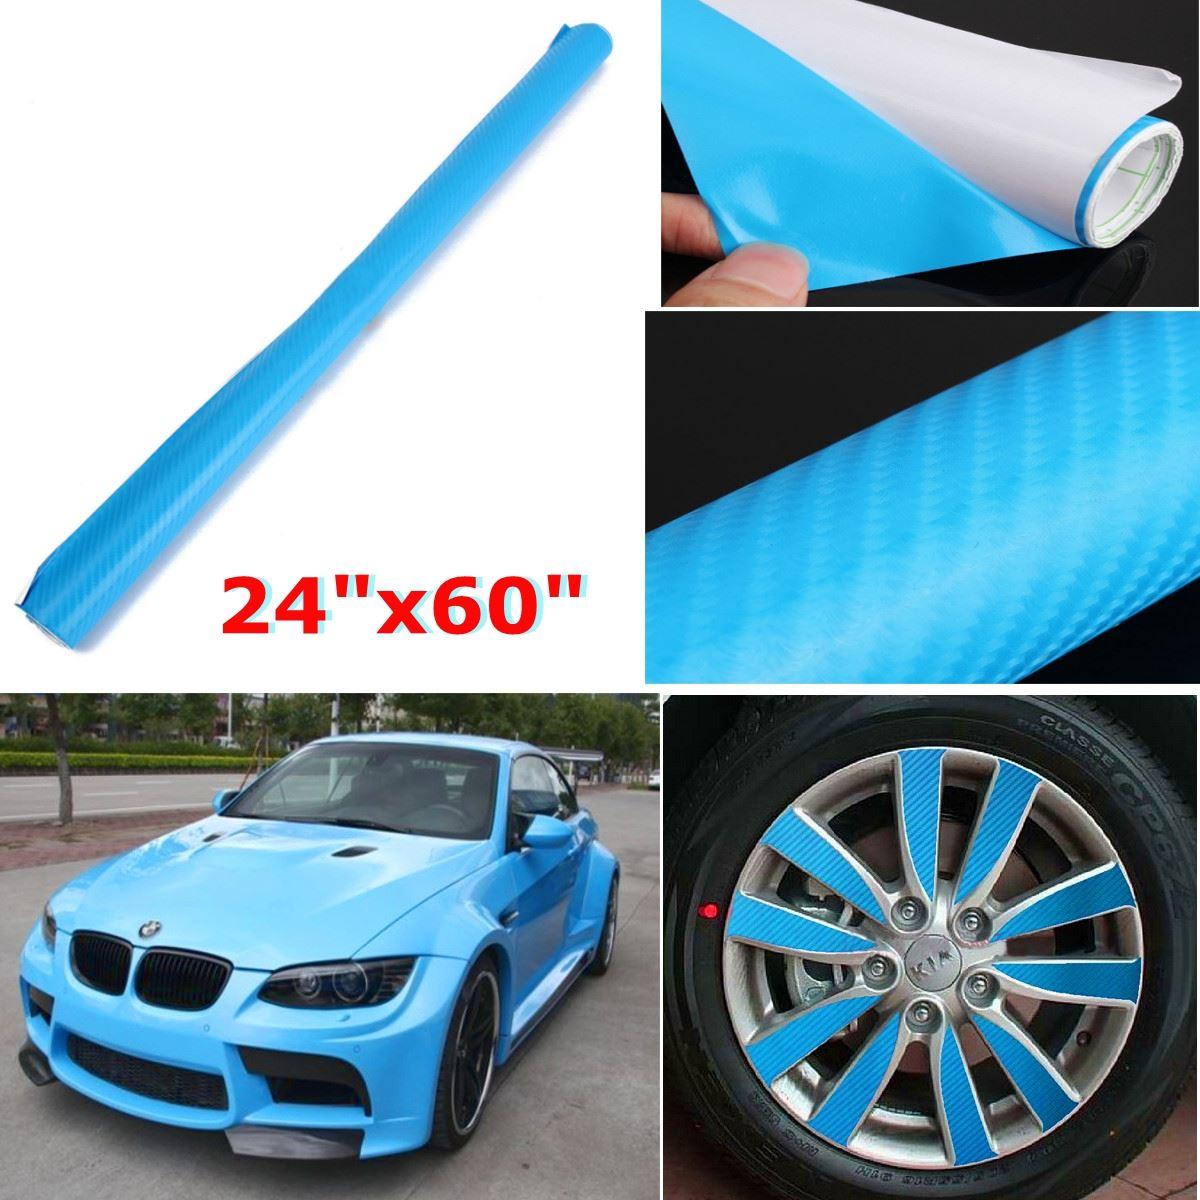 Car carbon sticker design - 60x152cm 4d Gloss Blue Car Carbon Fiber Vinyl Wrap Skin Sticker Decal Cover Diy 24x 60